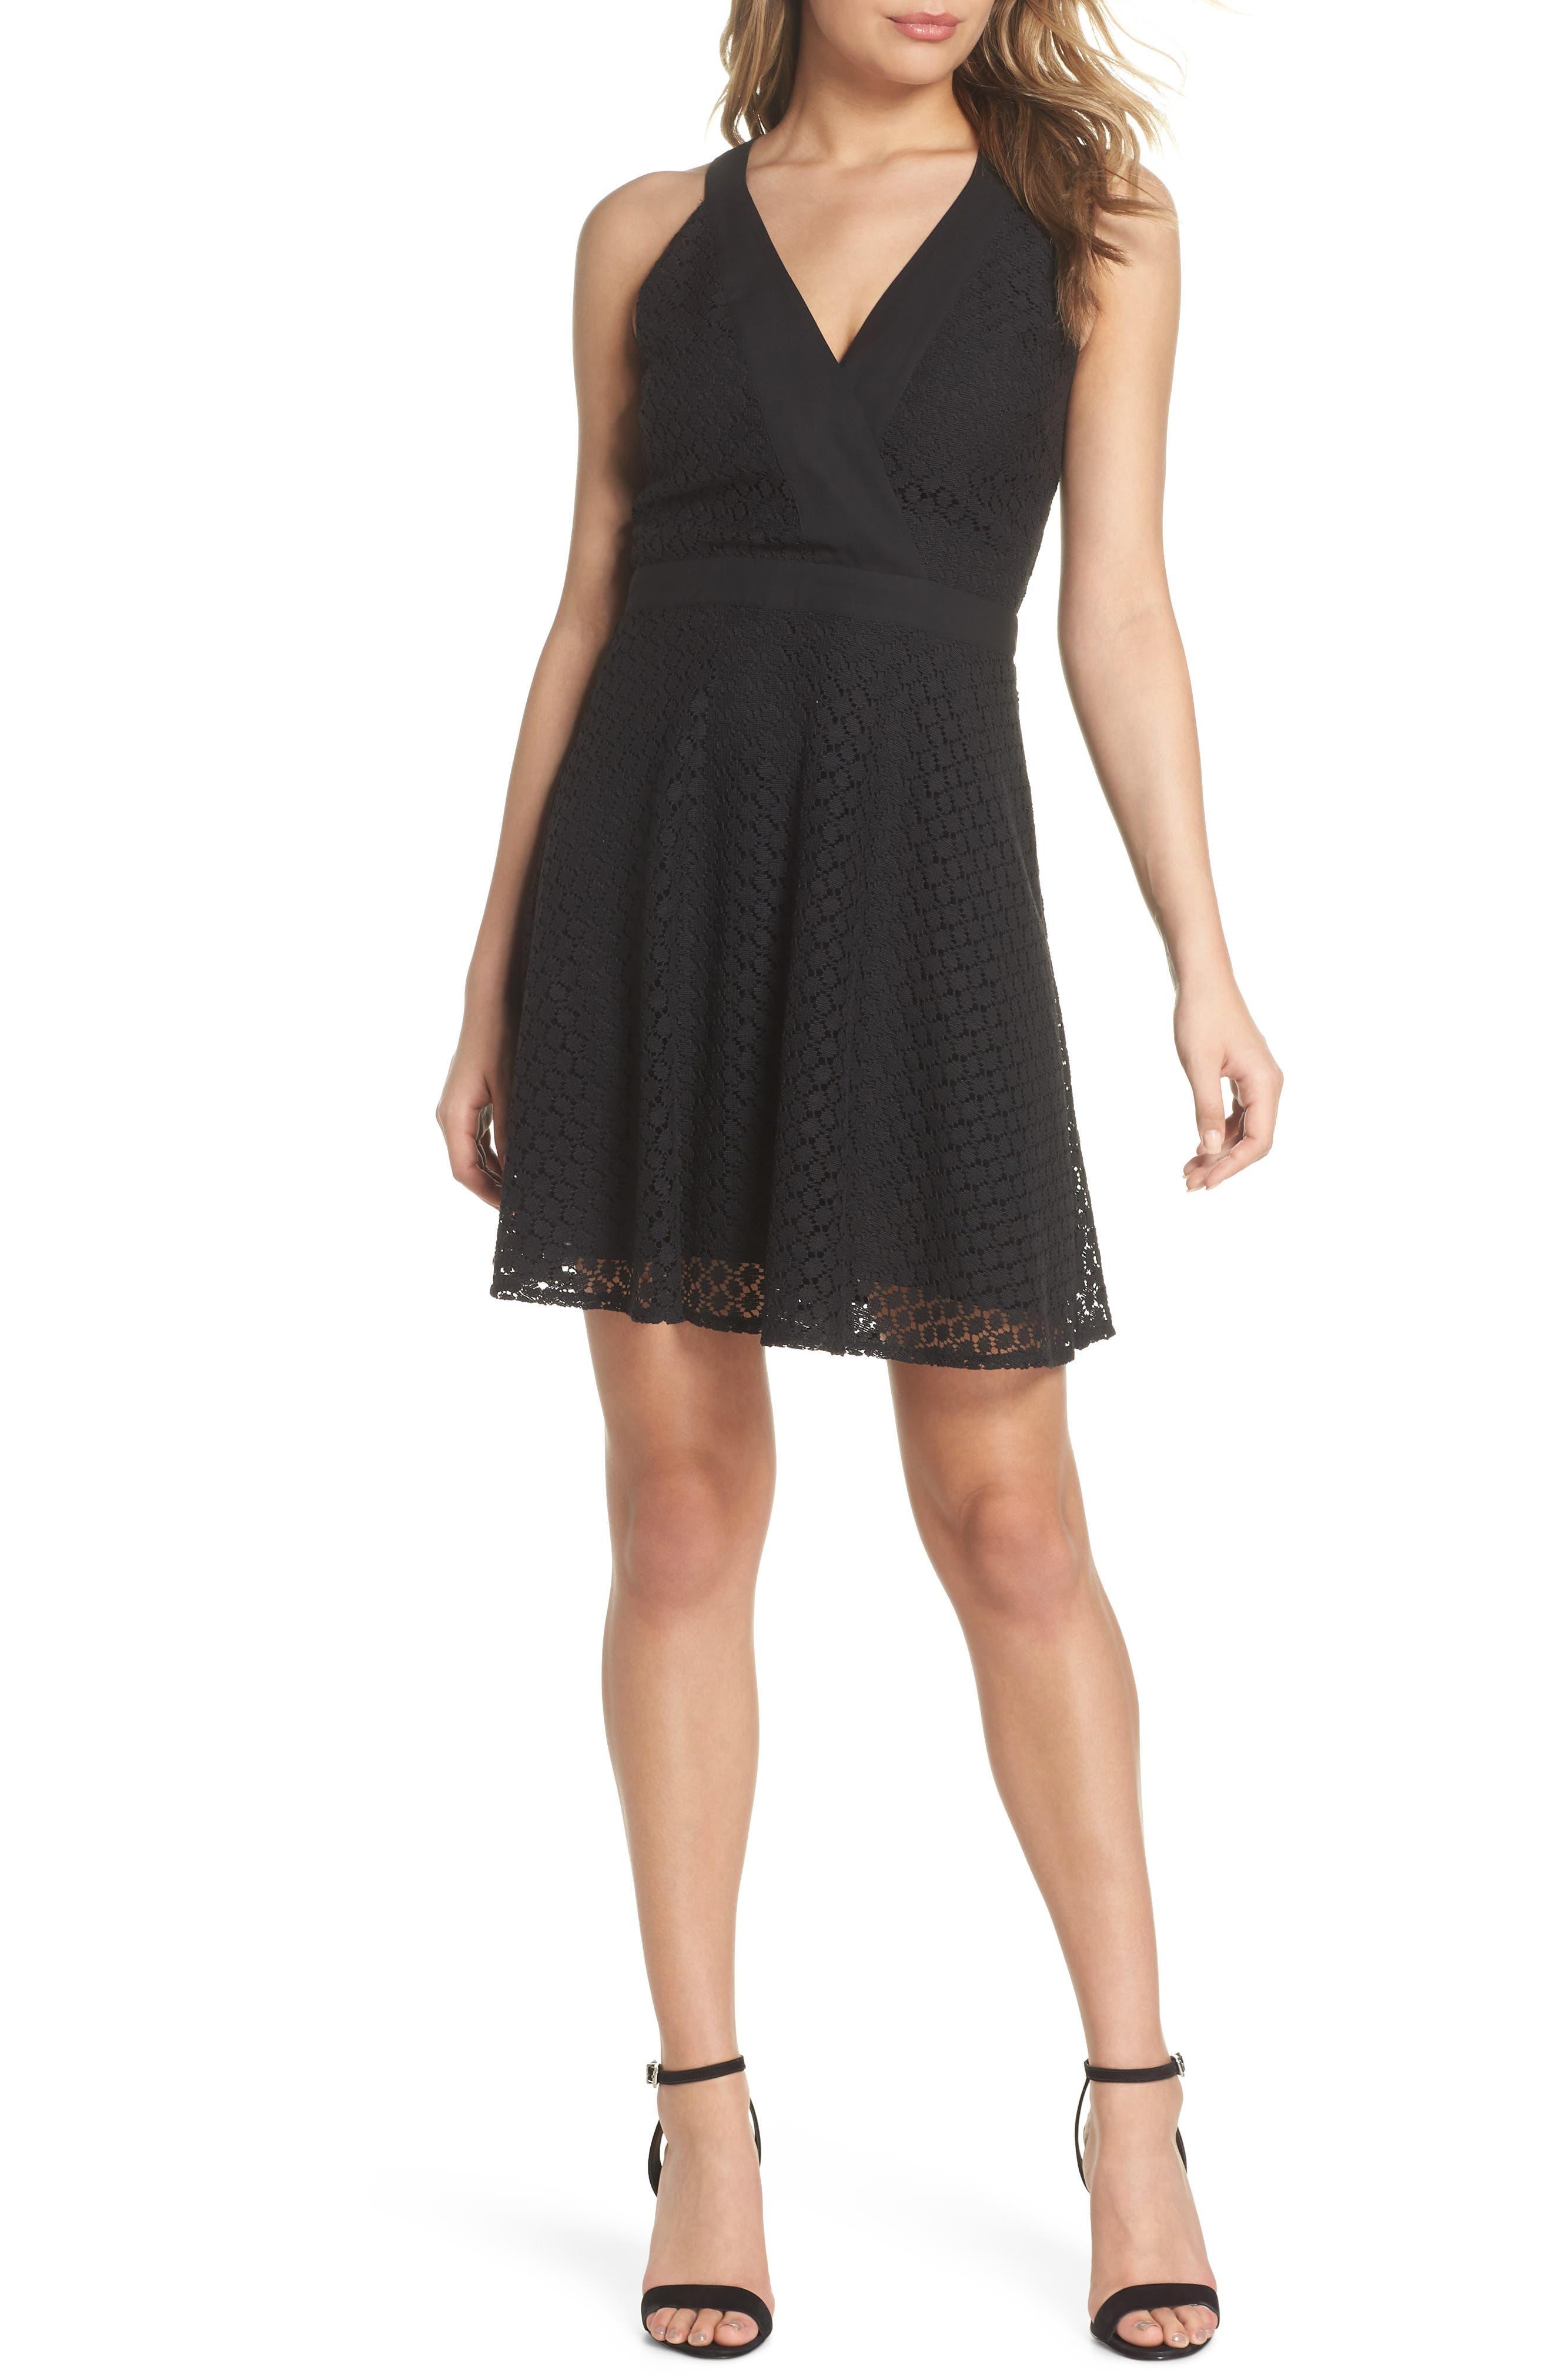 19 Cooper Lace Halter Dress